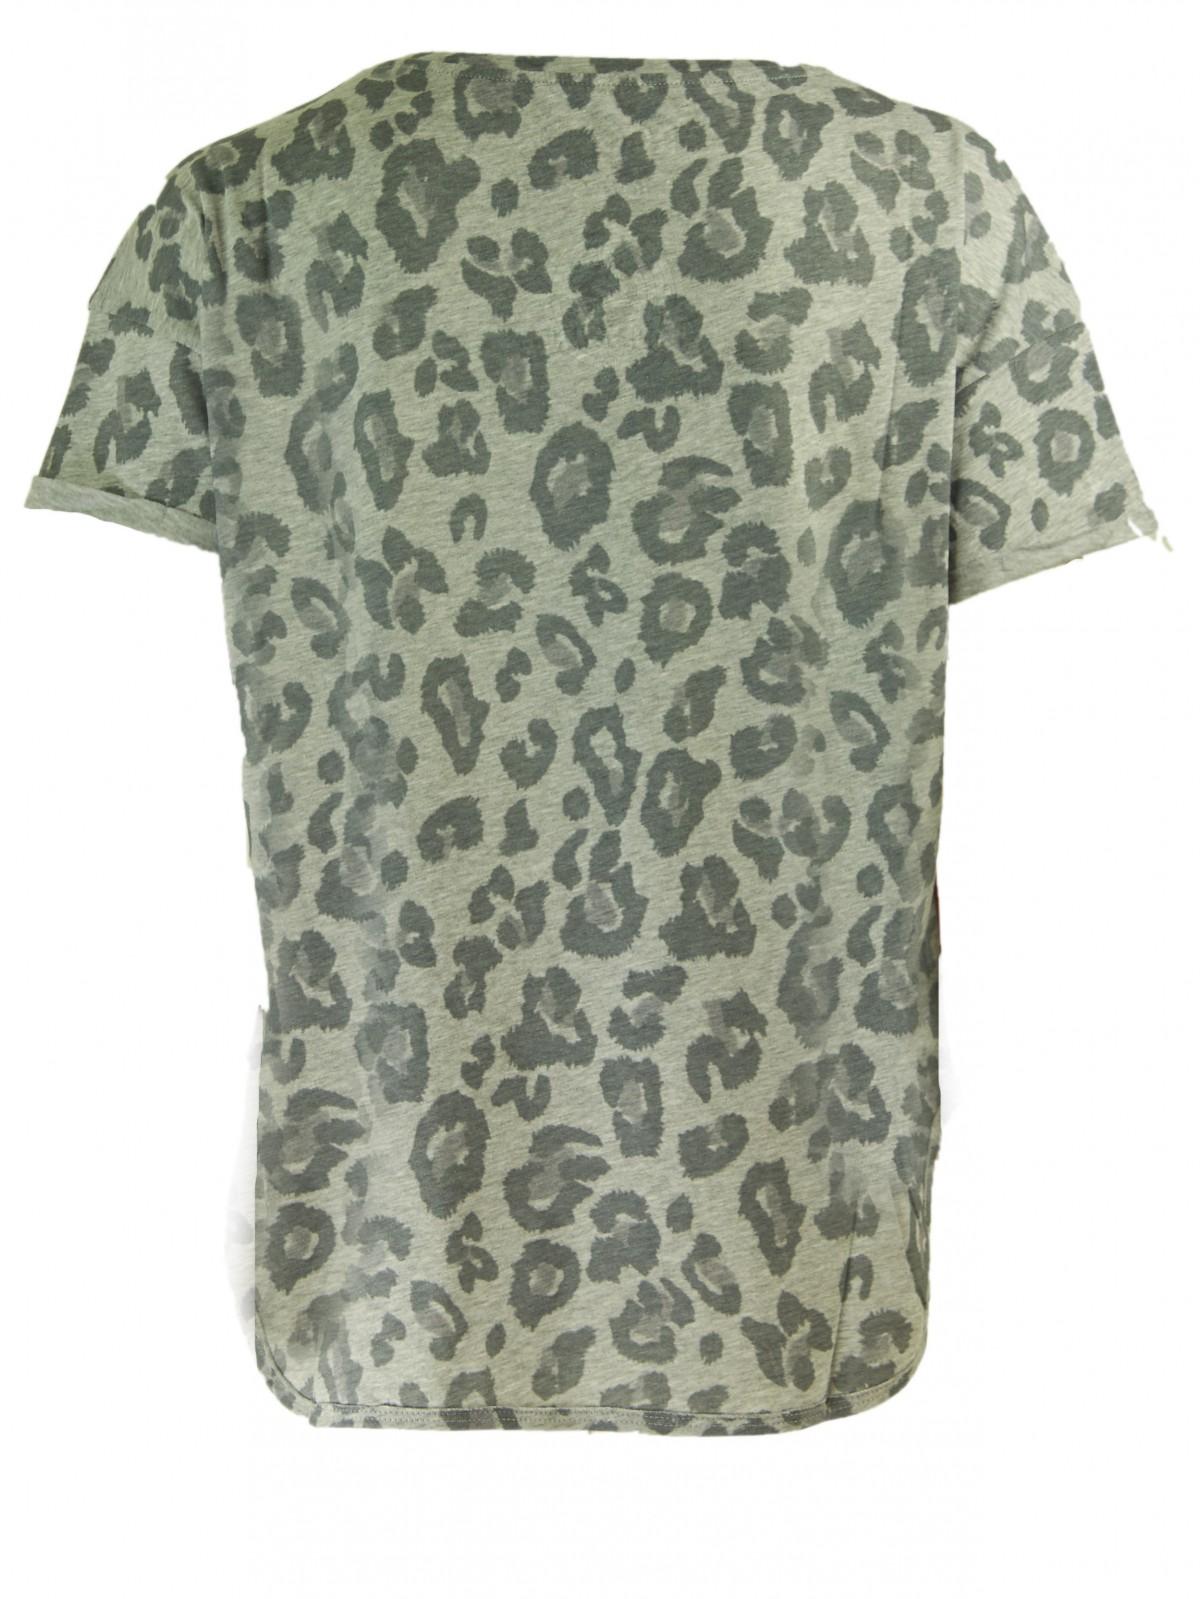 Tweety T-Shirt mit Leopardenprint